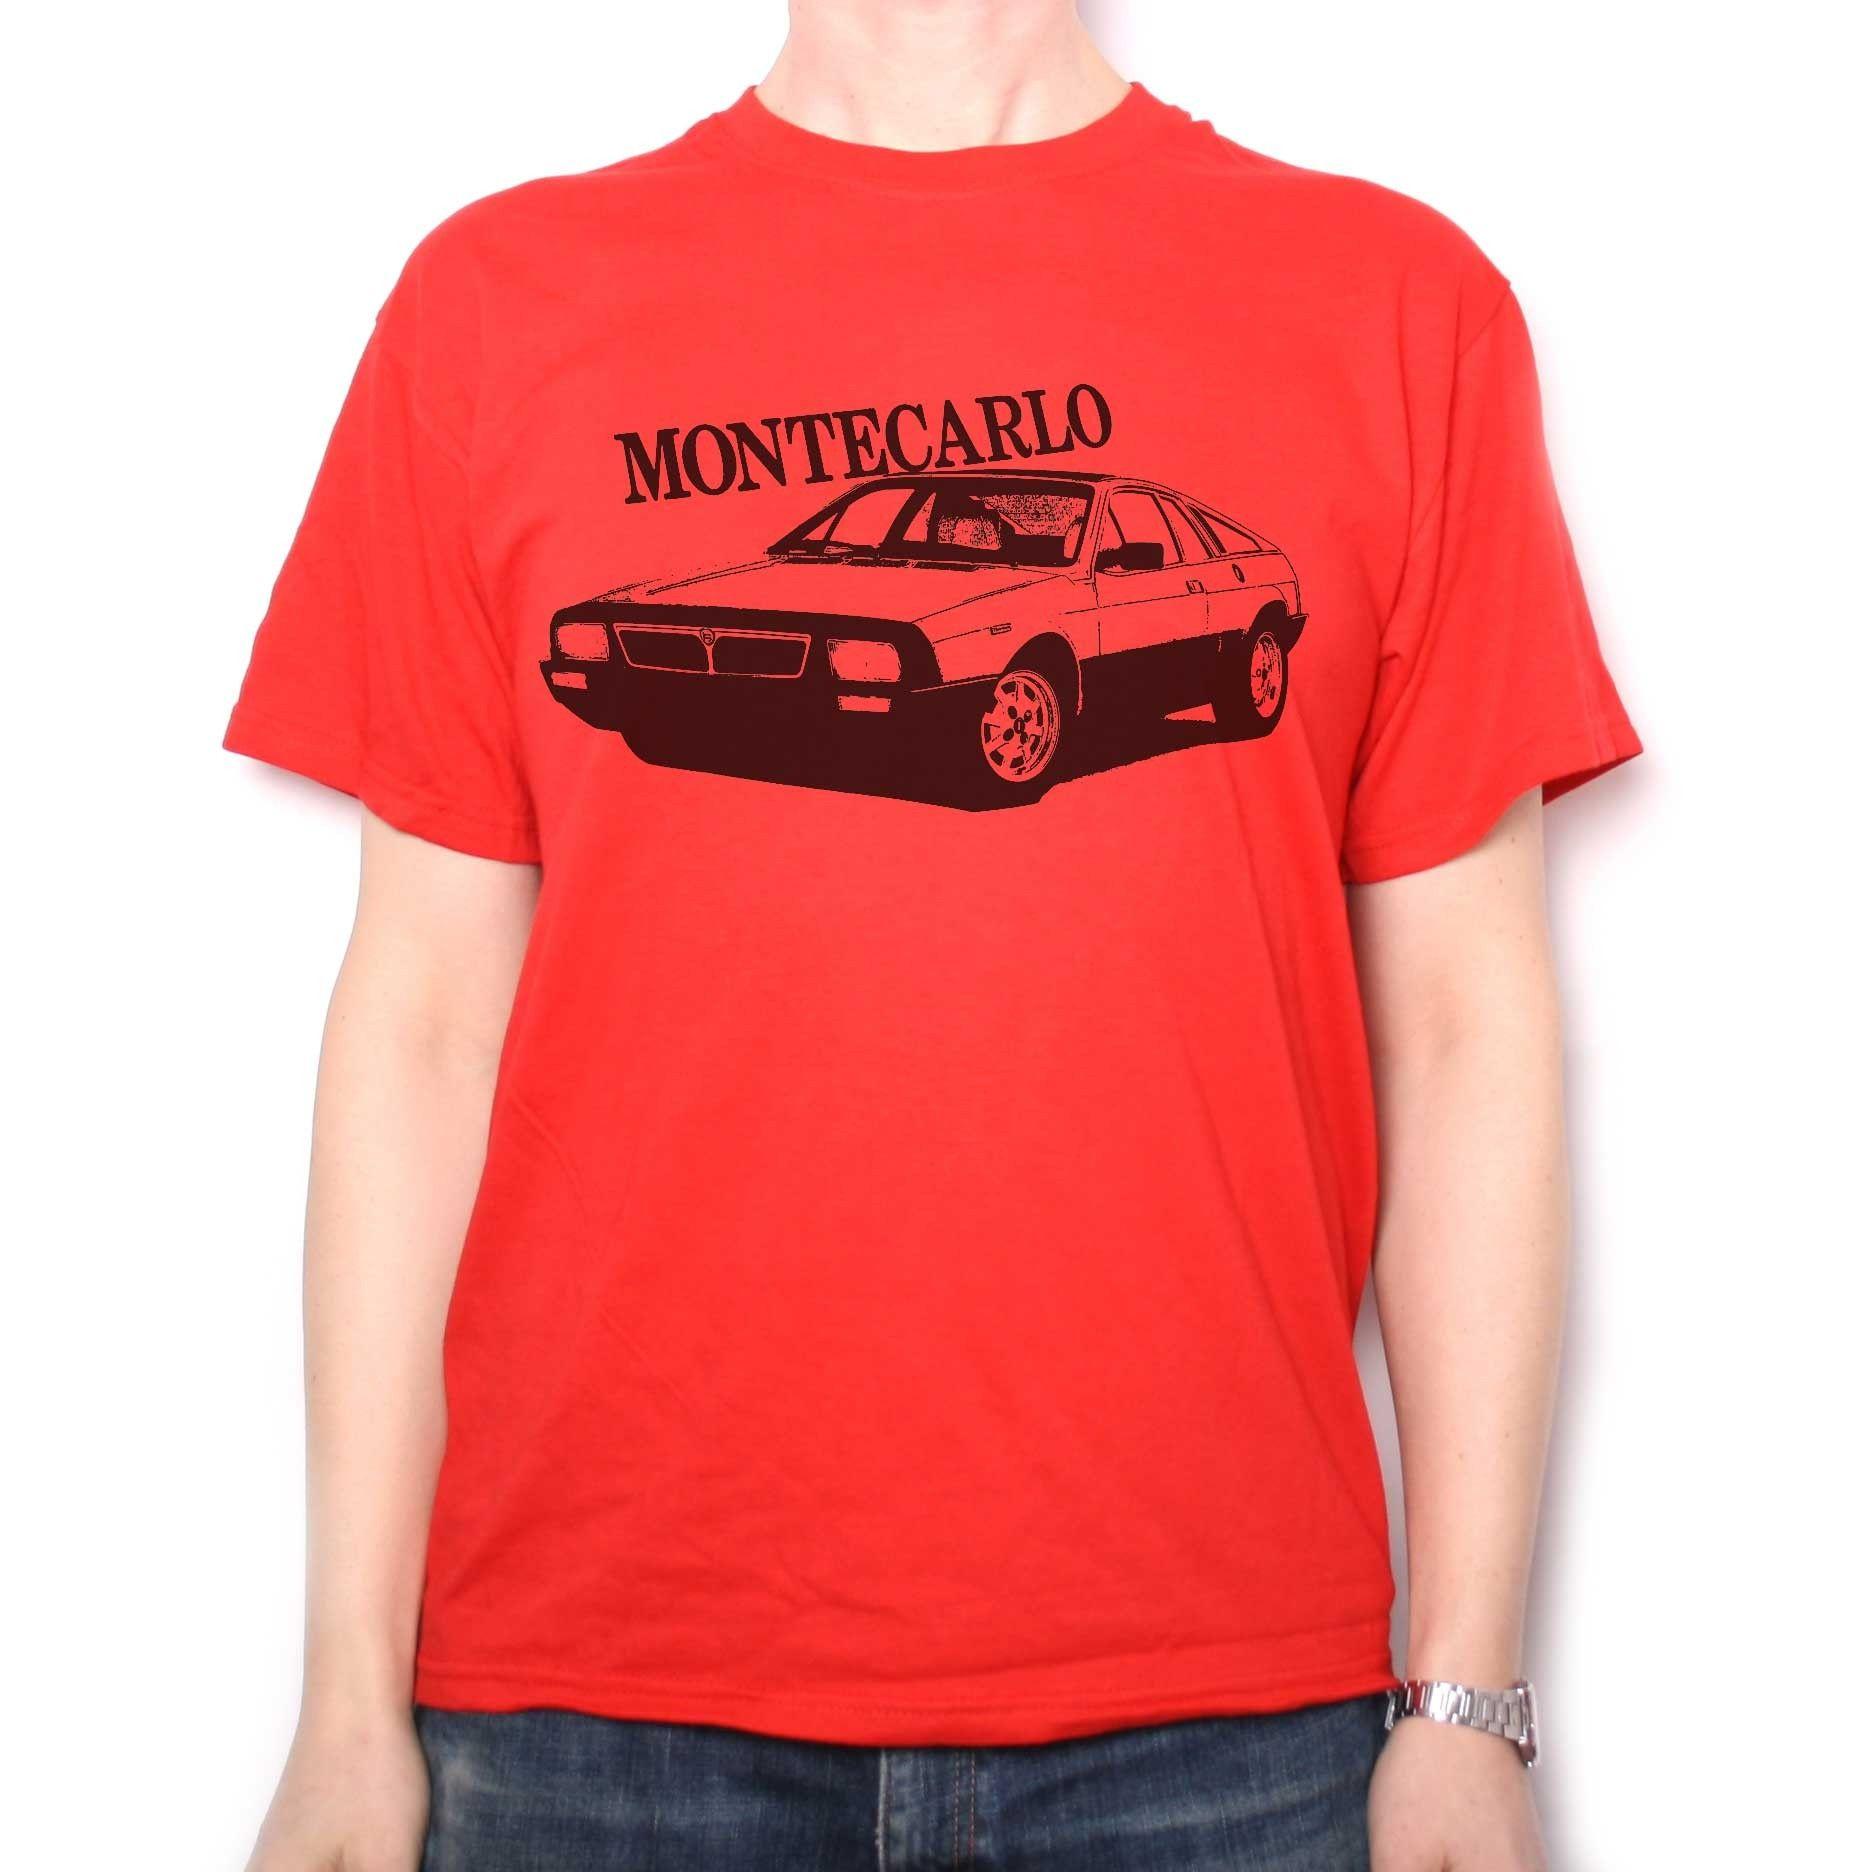 30f9e598c125a0 Classic Car T Shirt - Lancia Montecarlo   Automotive T Shirts   T ...